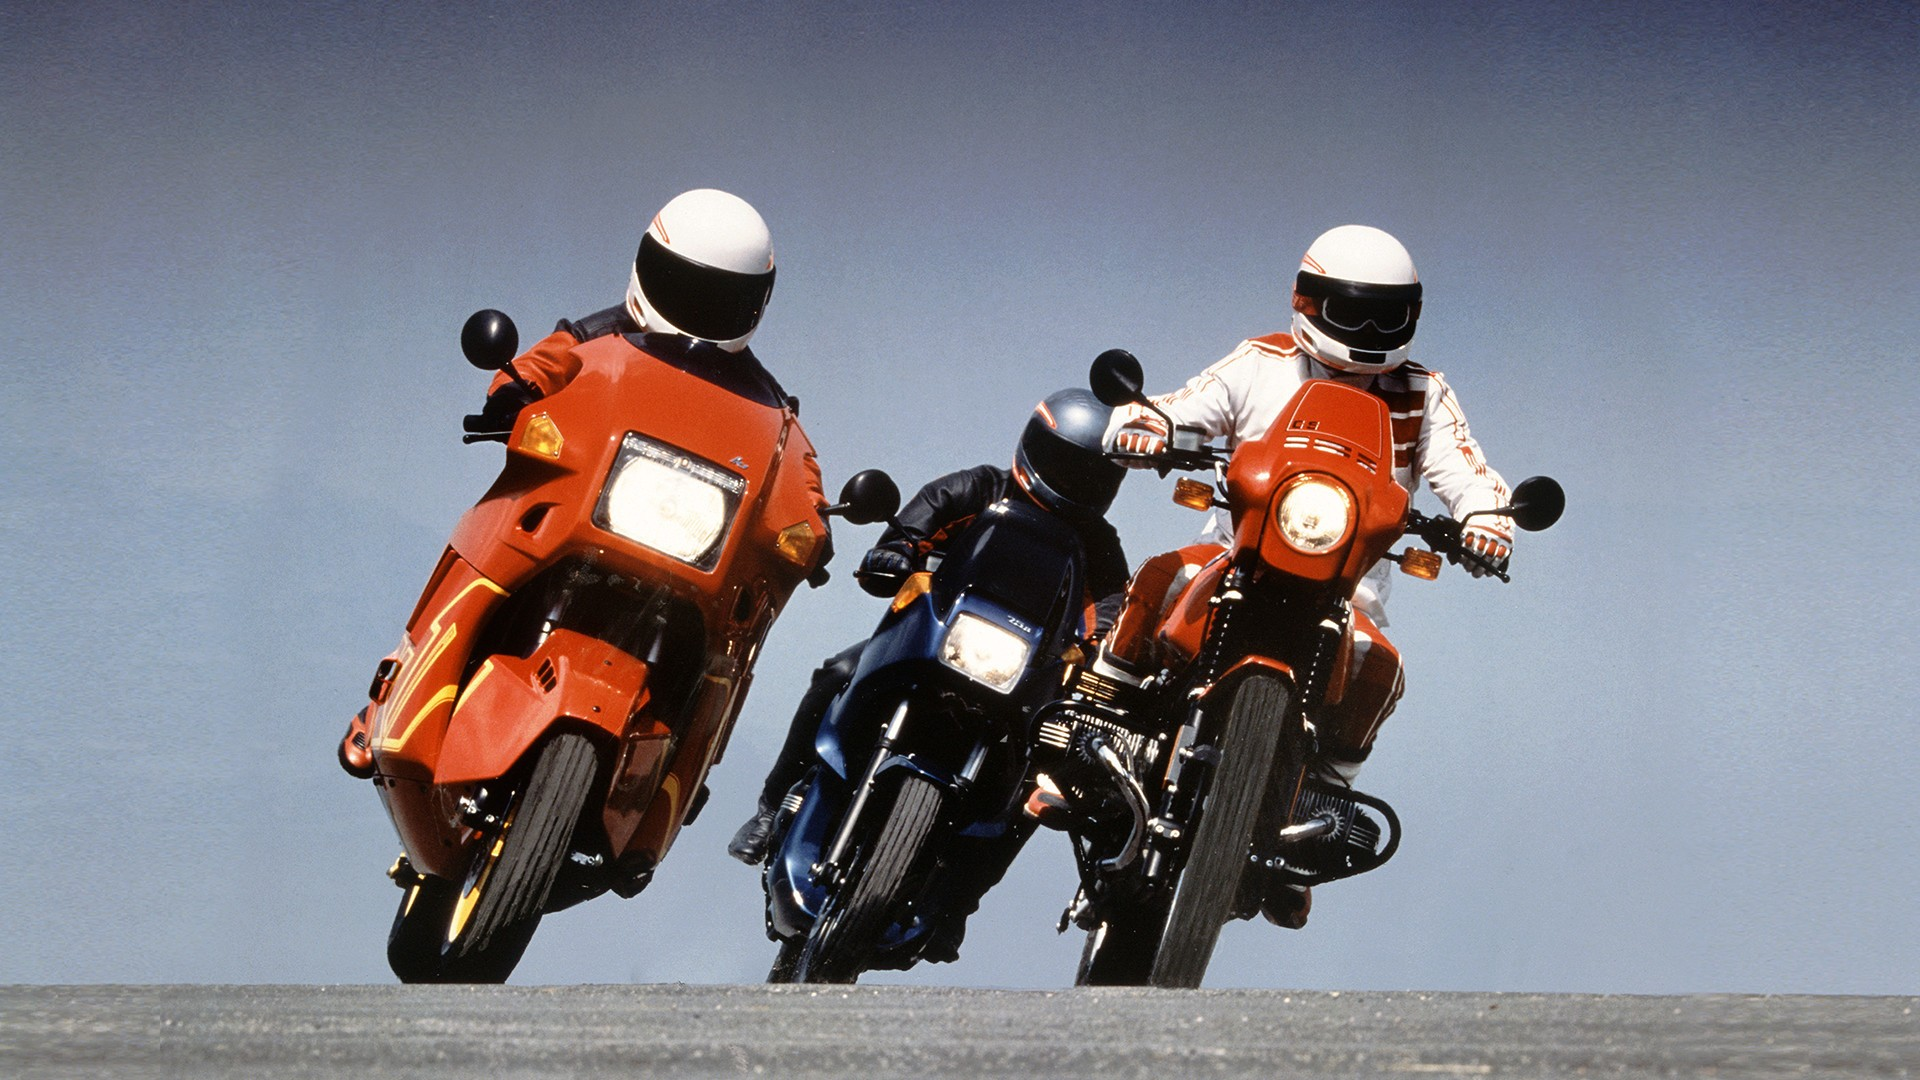 1995 год – 100 000 мотоциклов BMW с ABS